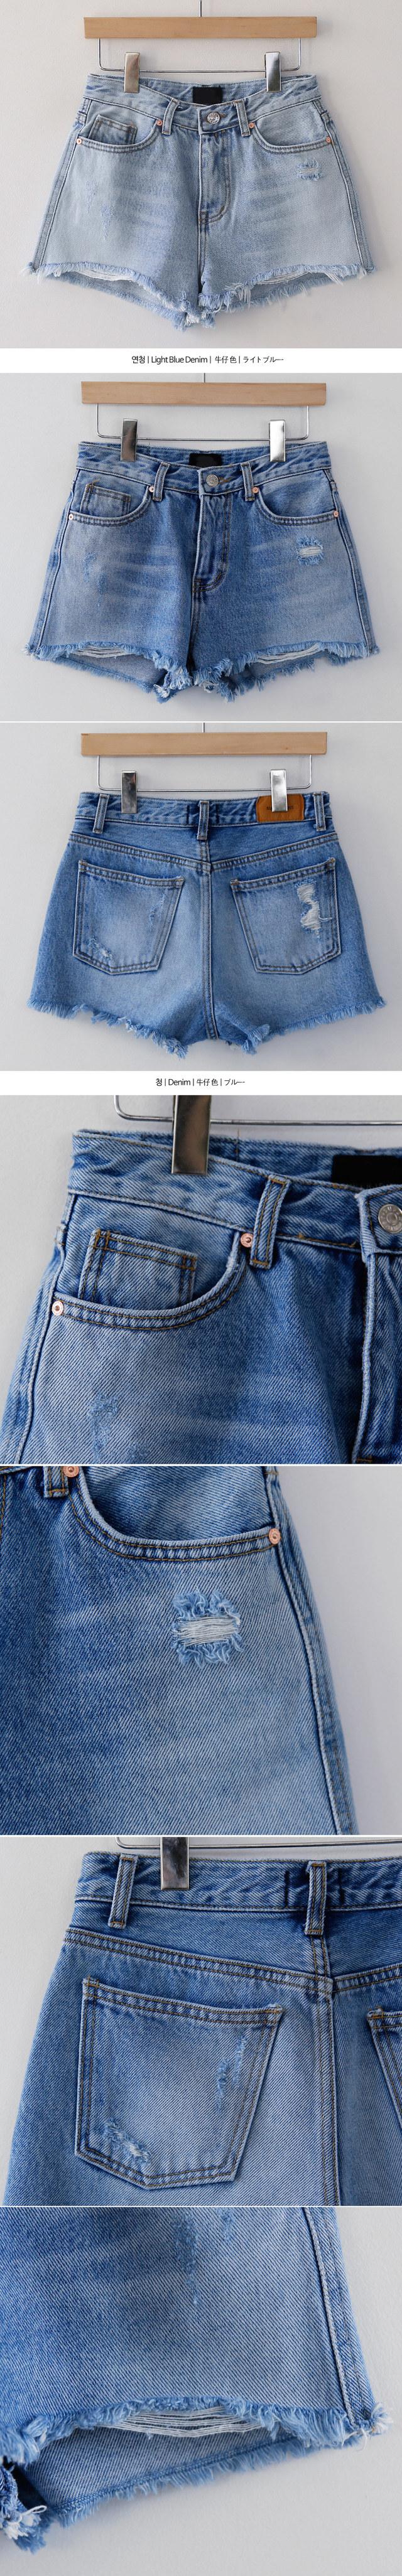 Patch Vintage Shorts